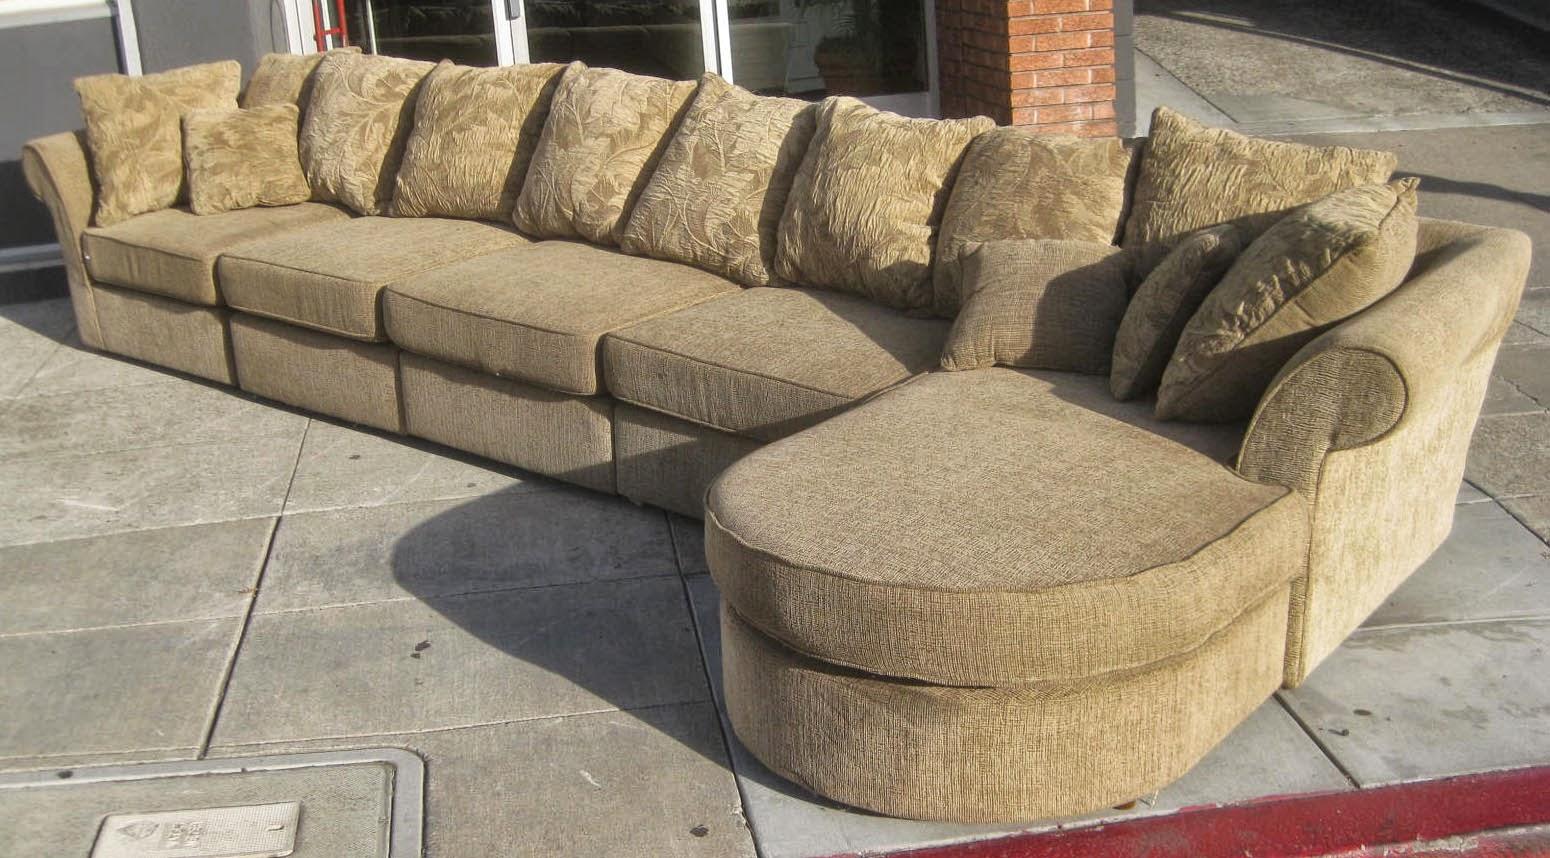 Uhuru Furniture Collectibles Sold Sectional Sofa 200